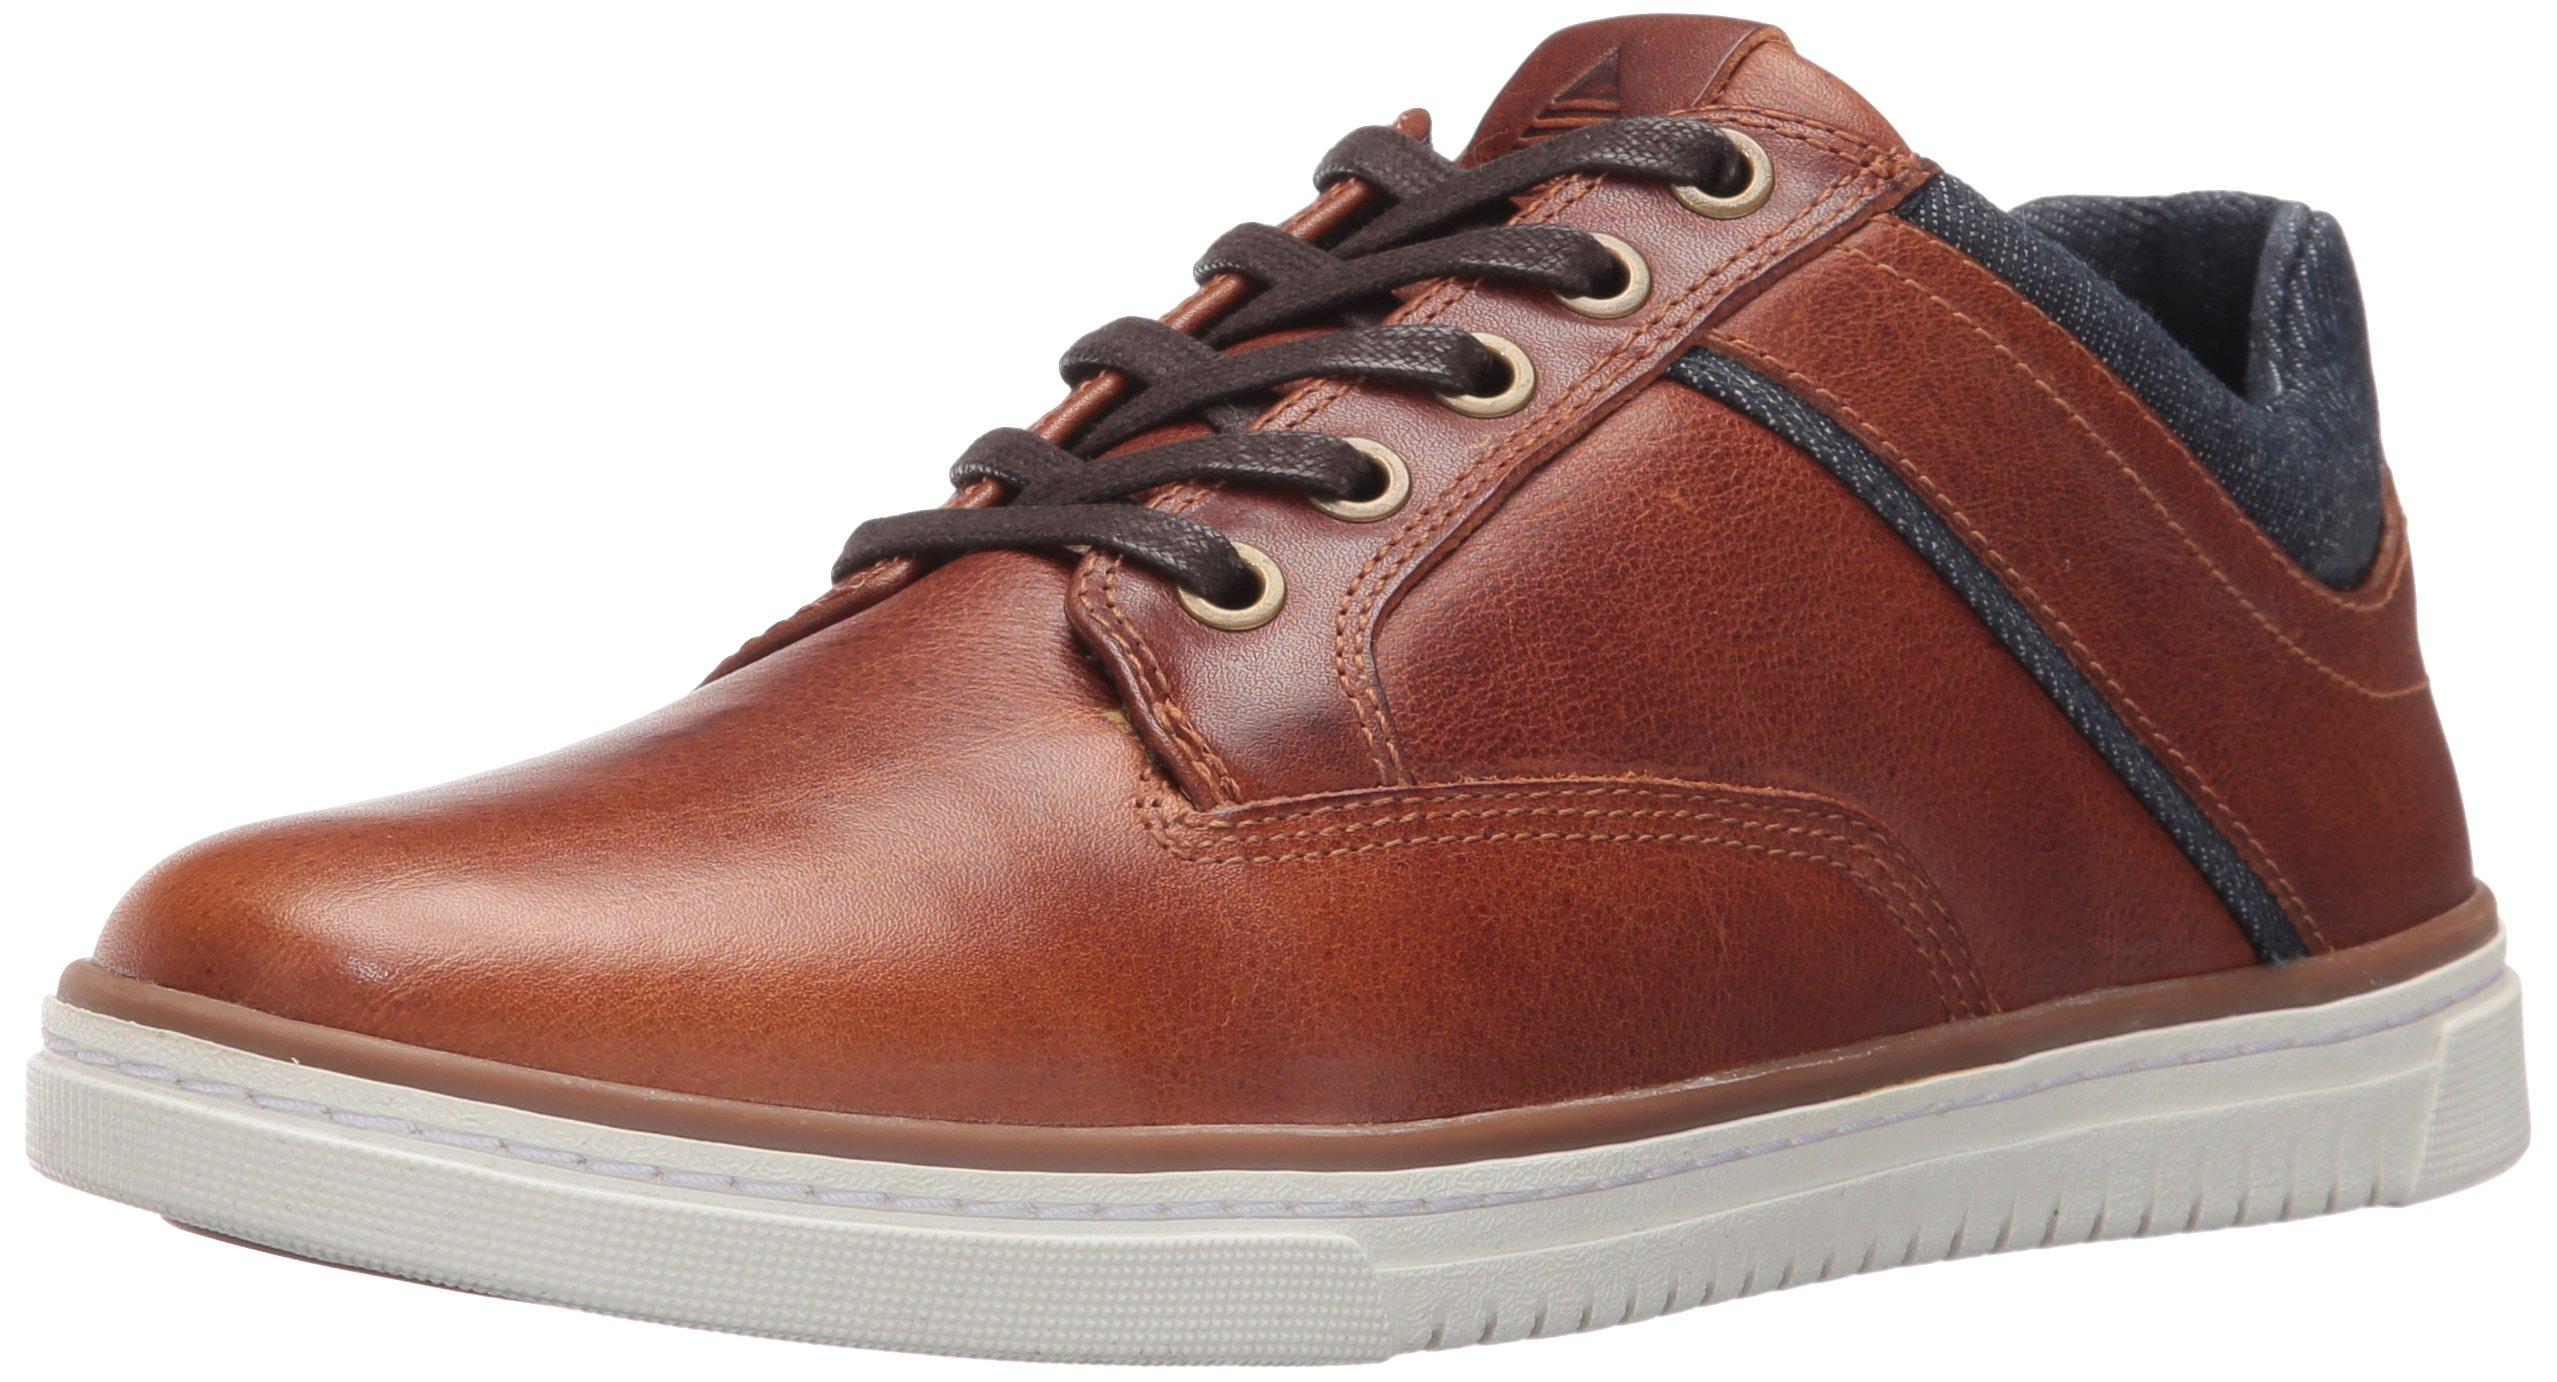 Aldo Men's Tracasi Fashion Sneaker, Cognac, 9.5 D US